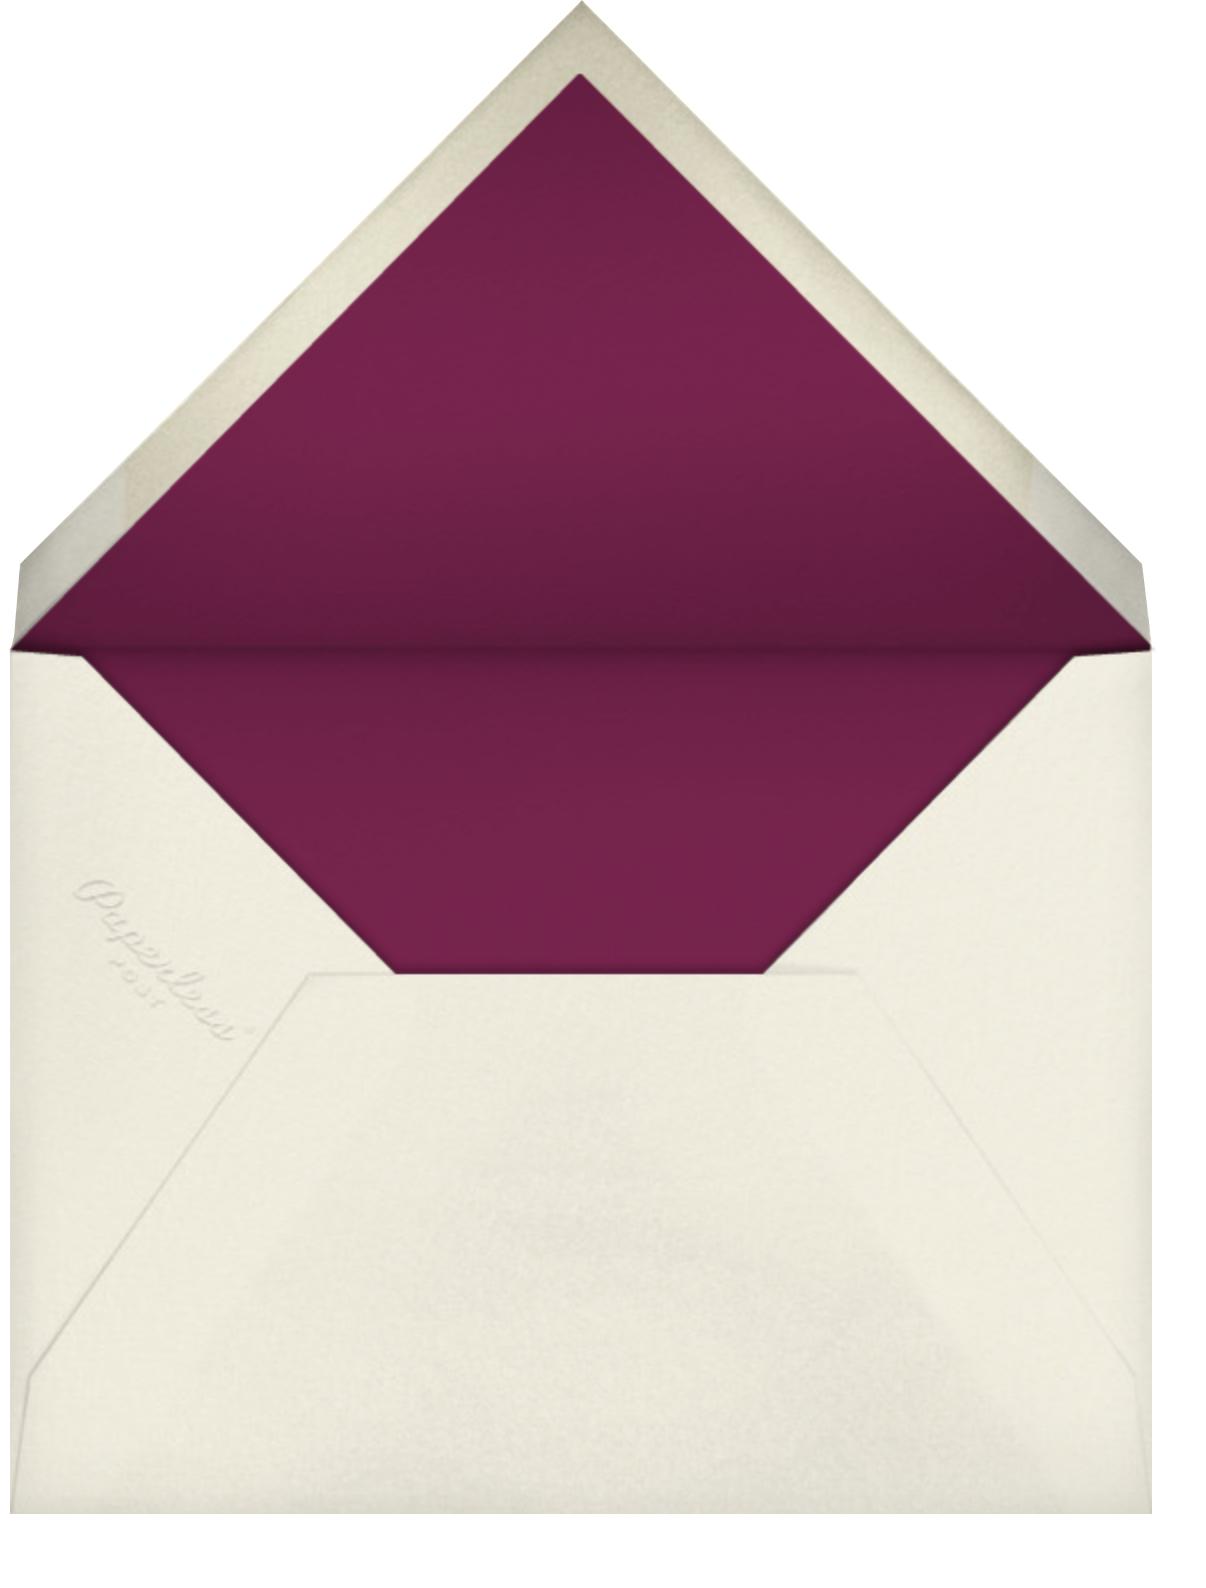 Ballet Birthday (Yelena Bryksenkova) - Deep - Red Cap Cards - Envelope